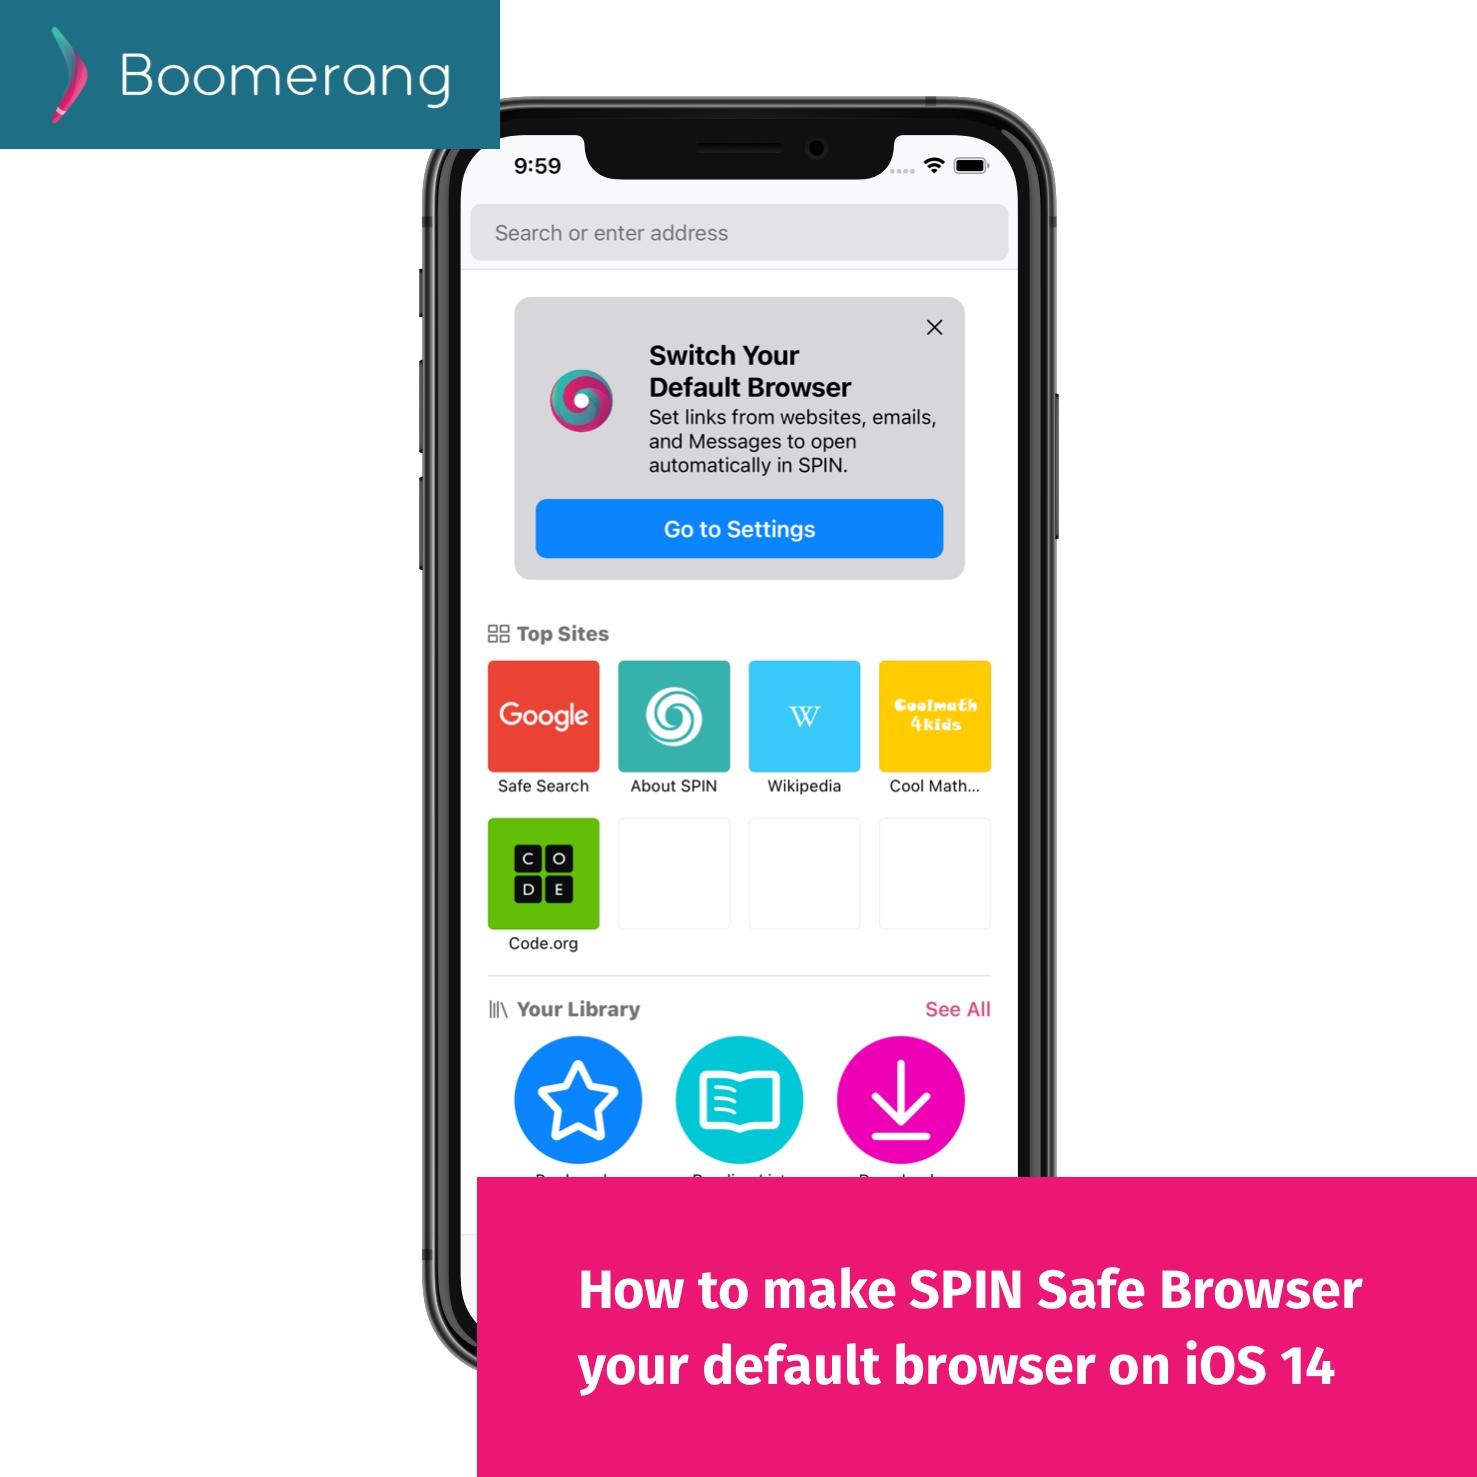 iOS 14 default browser